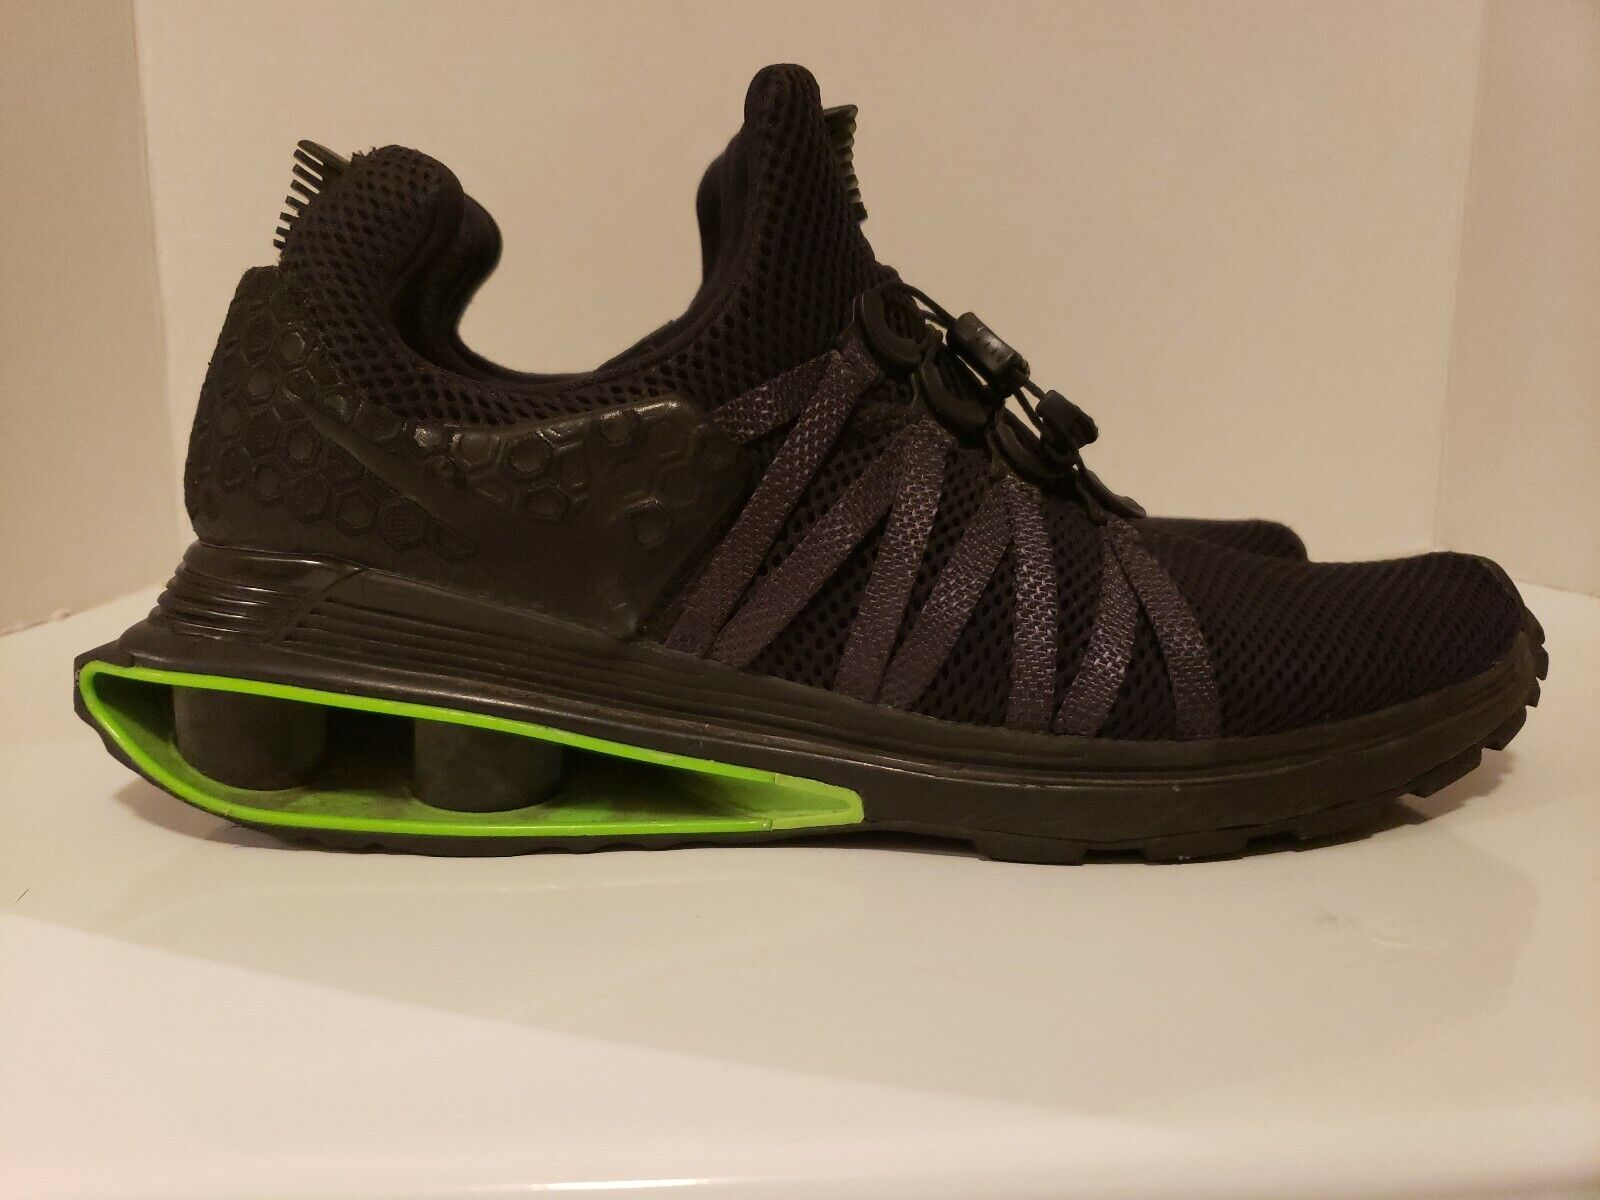 651eeb962c0 Nike Shox Gravity Luxe Black Green AR1470-003 Men's SZ 10.5 Strike  njxbxi3029-Athletic Shoes